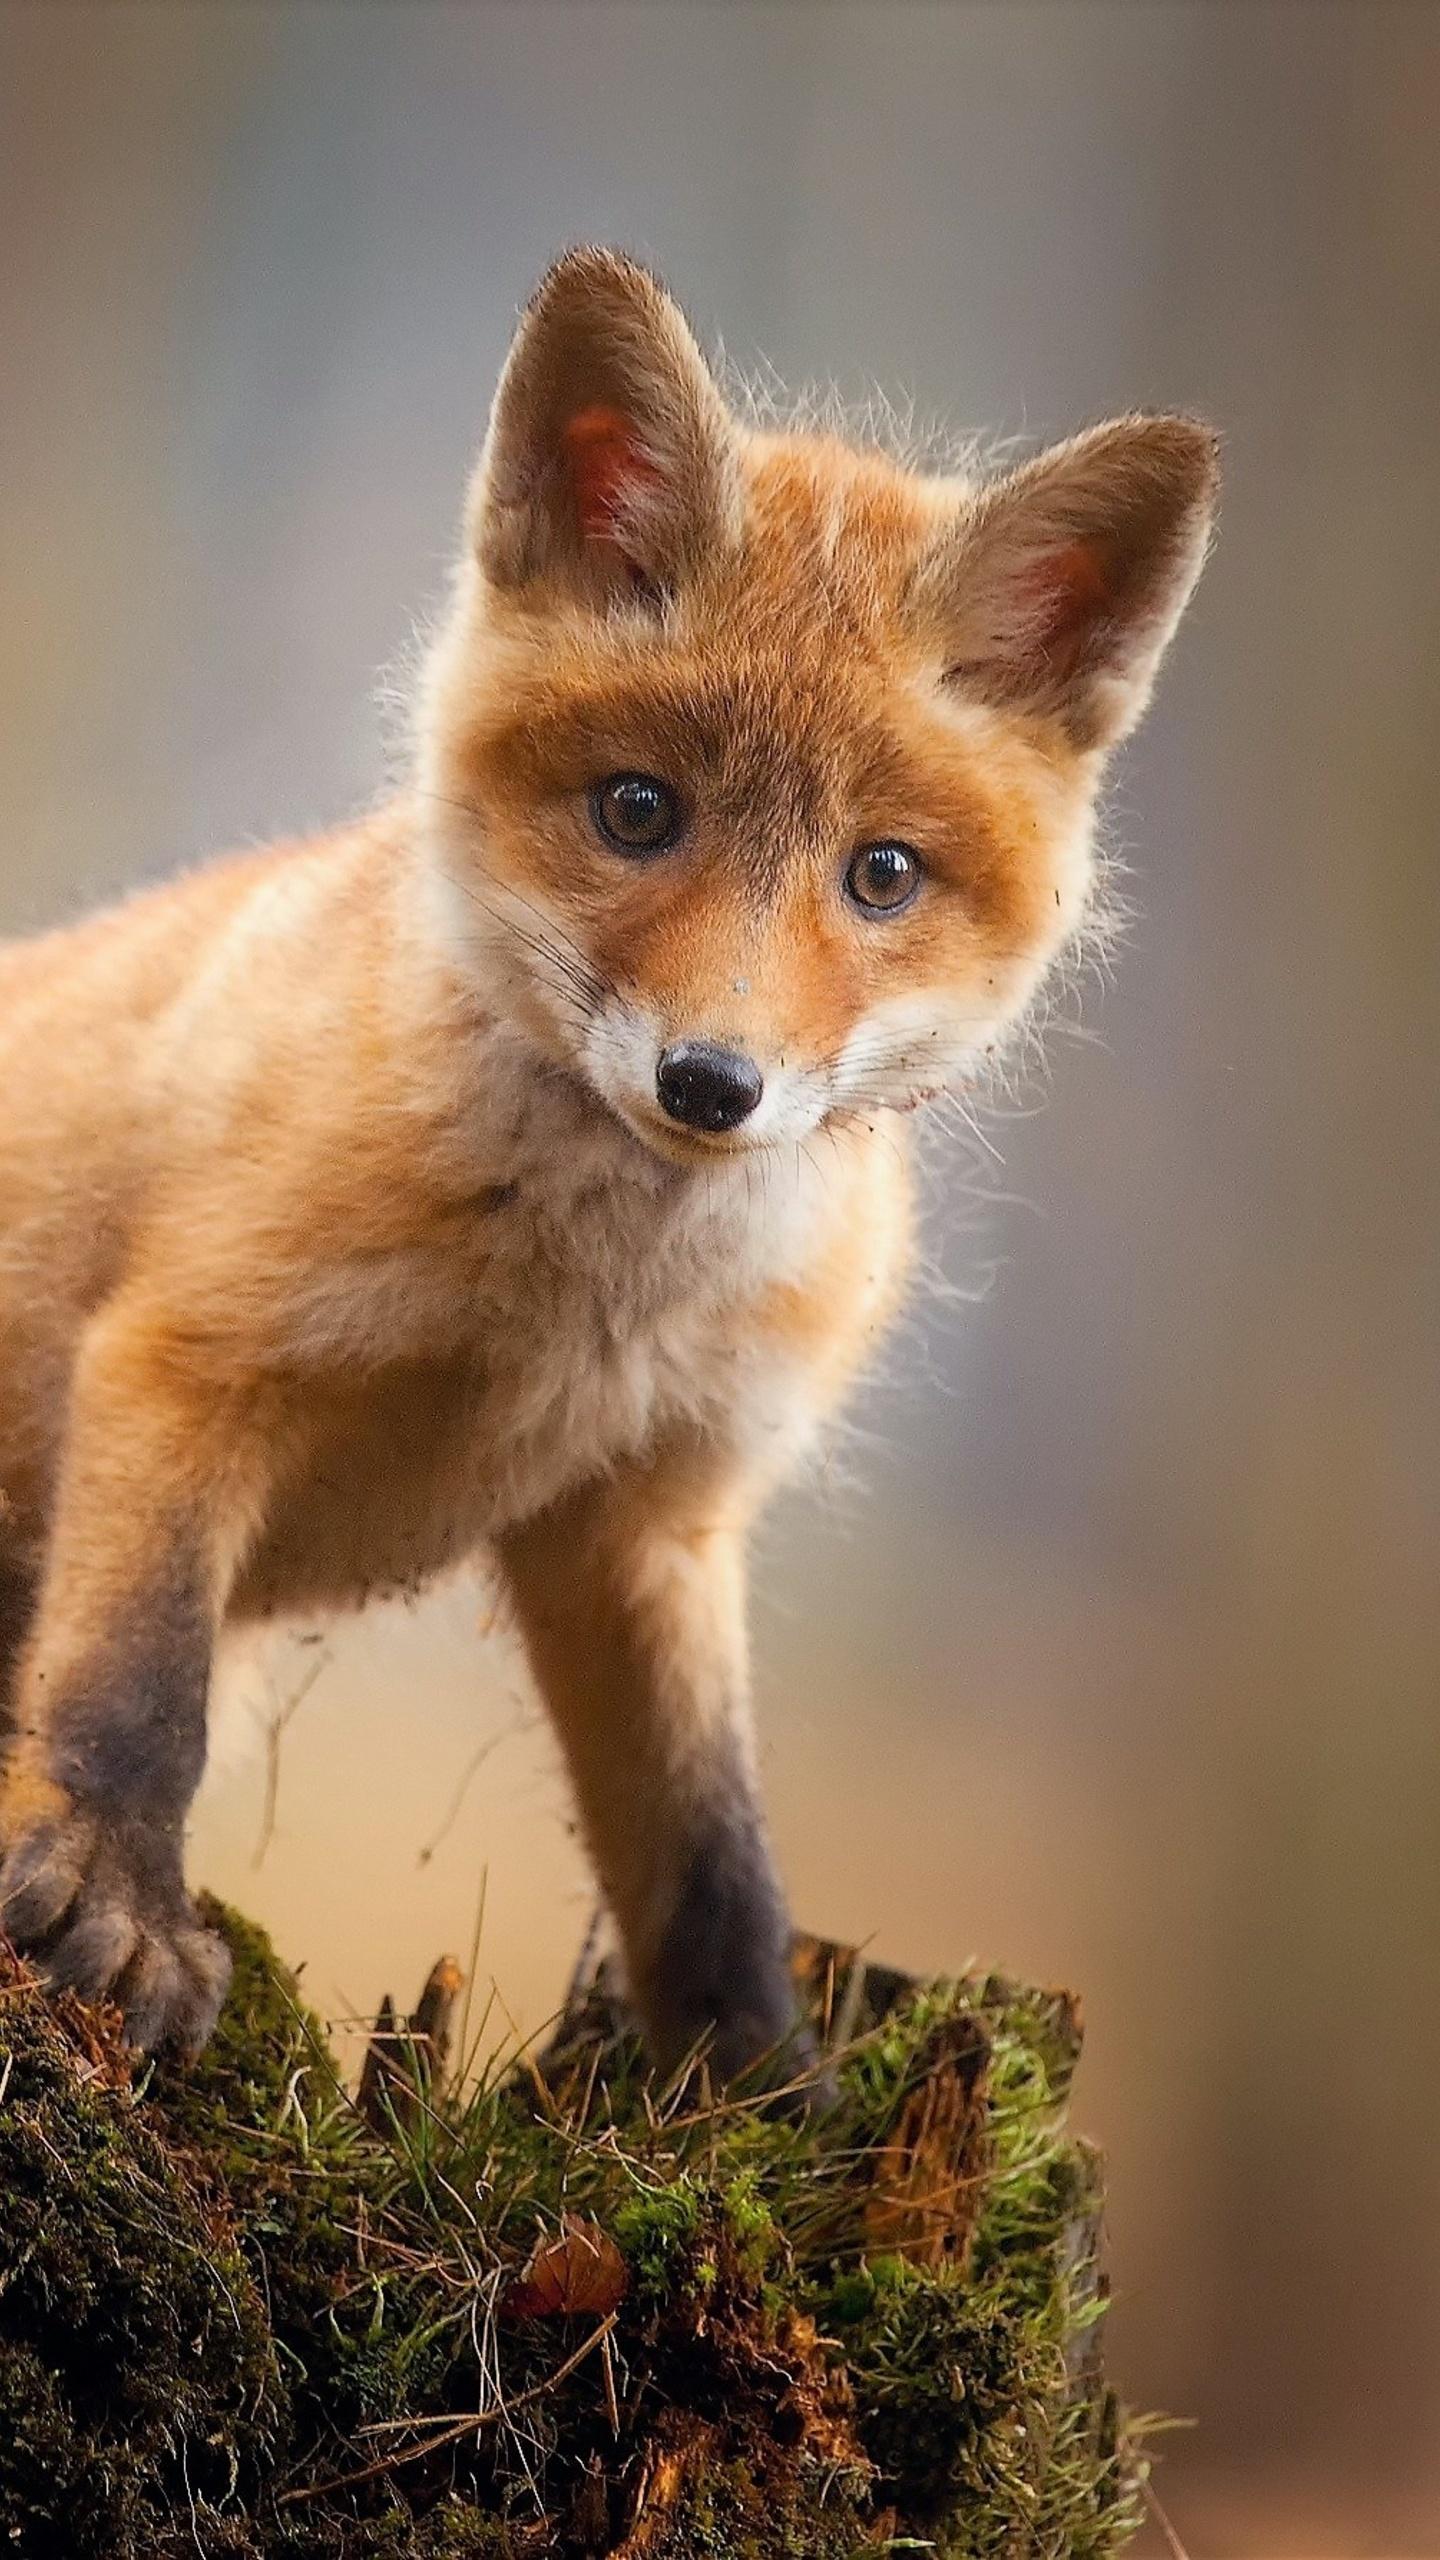 1440x2560 Fox Cub Baby Animal Cute Hd Samsung Galaxy S6,S7 ...